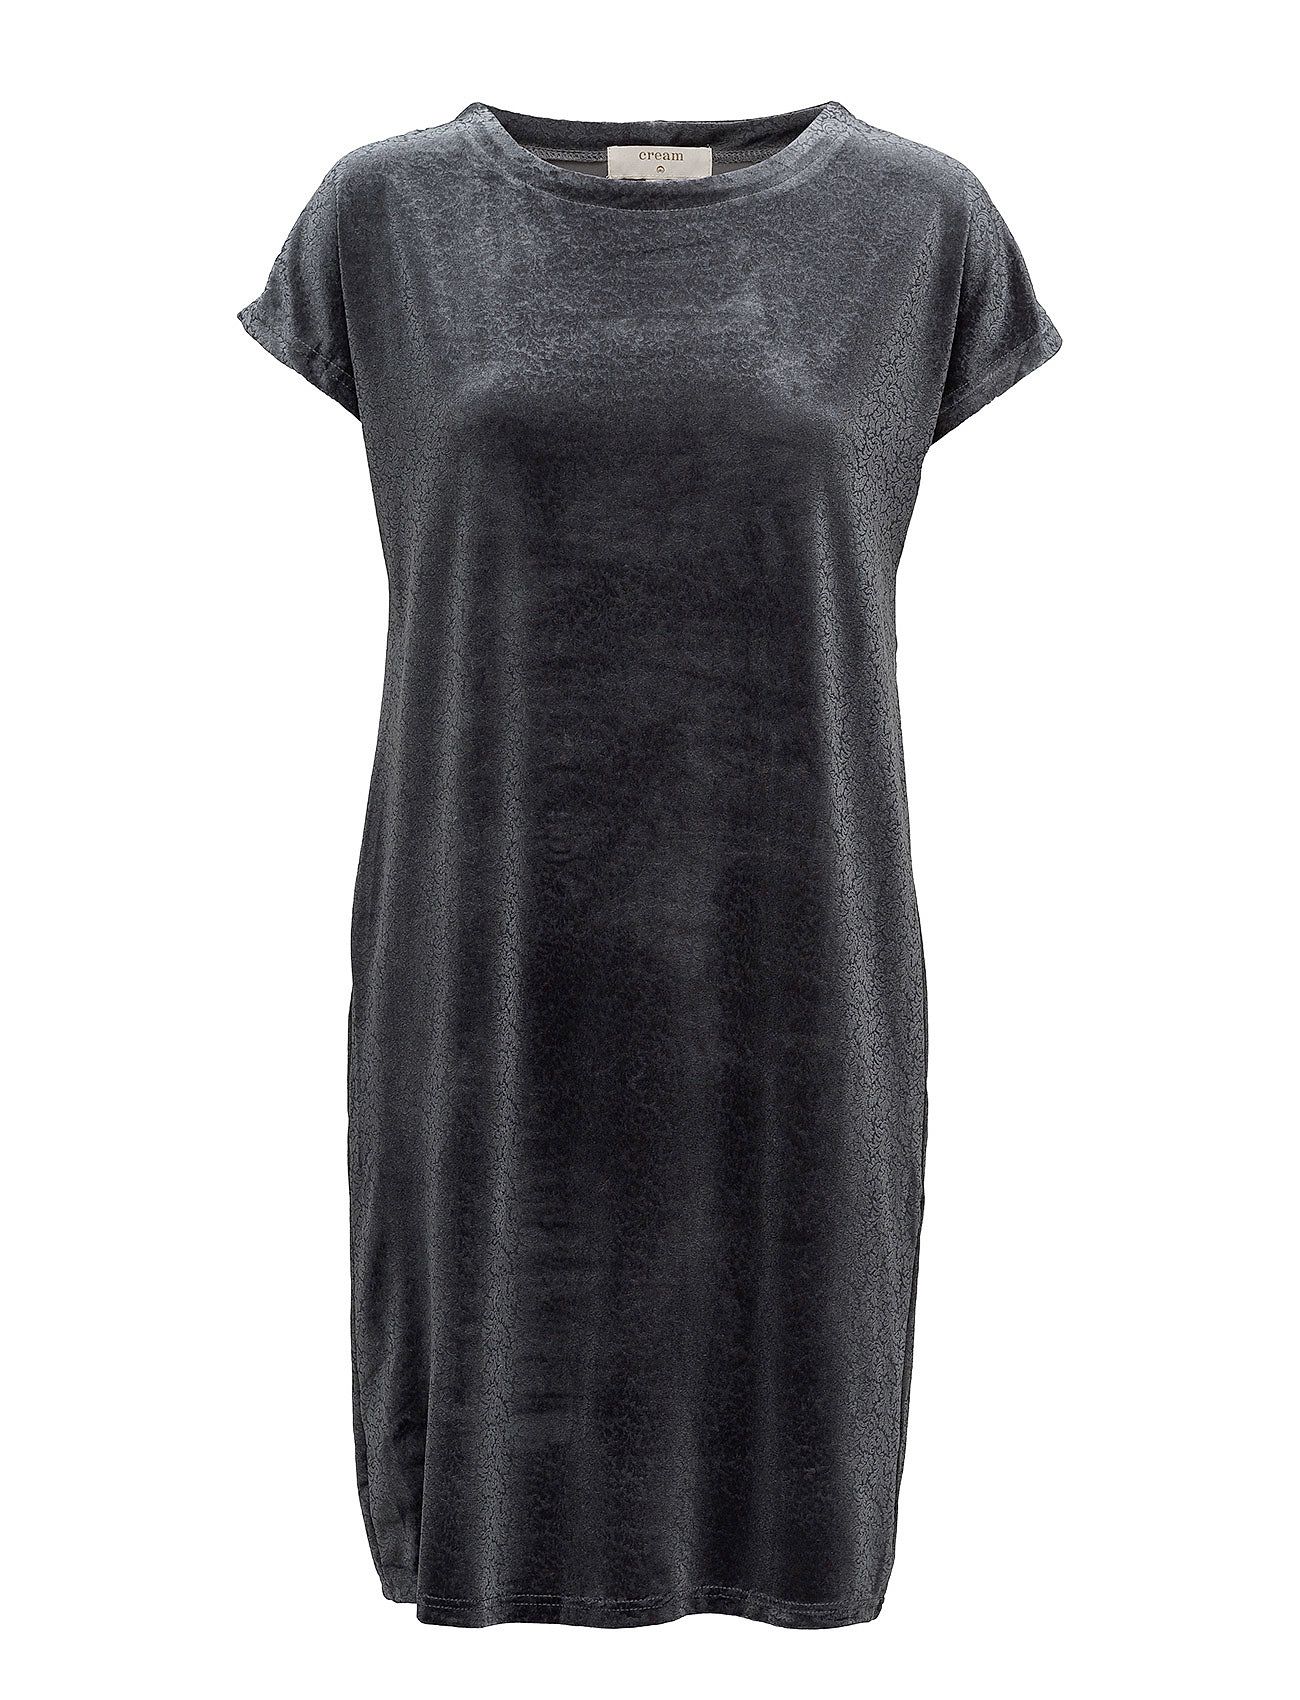 2f52160c3c22 Agnette Dress (Turbulence Grey) (£27.49) - Cream -